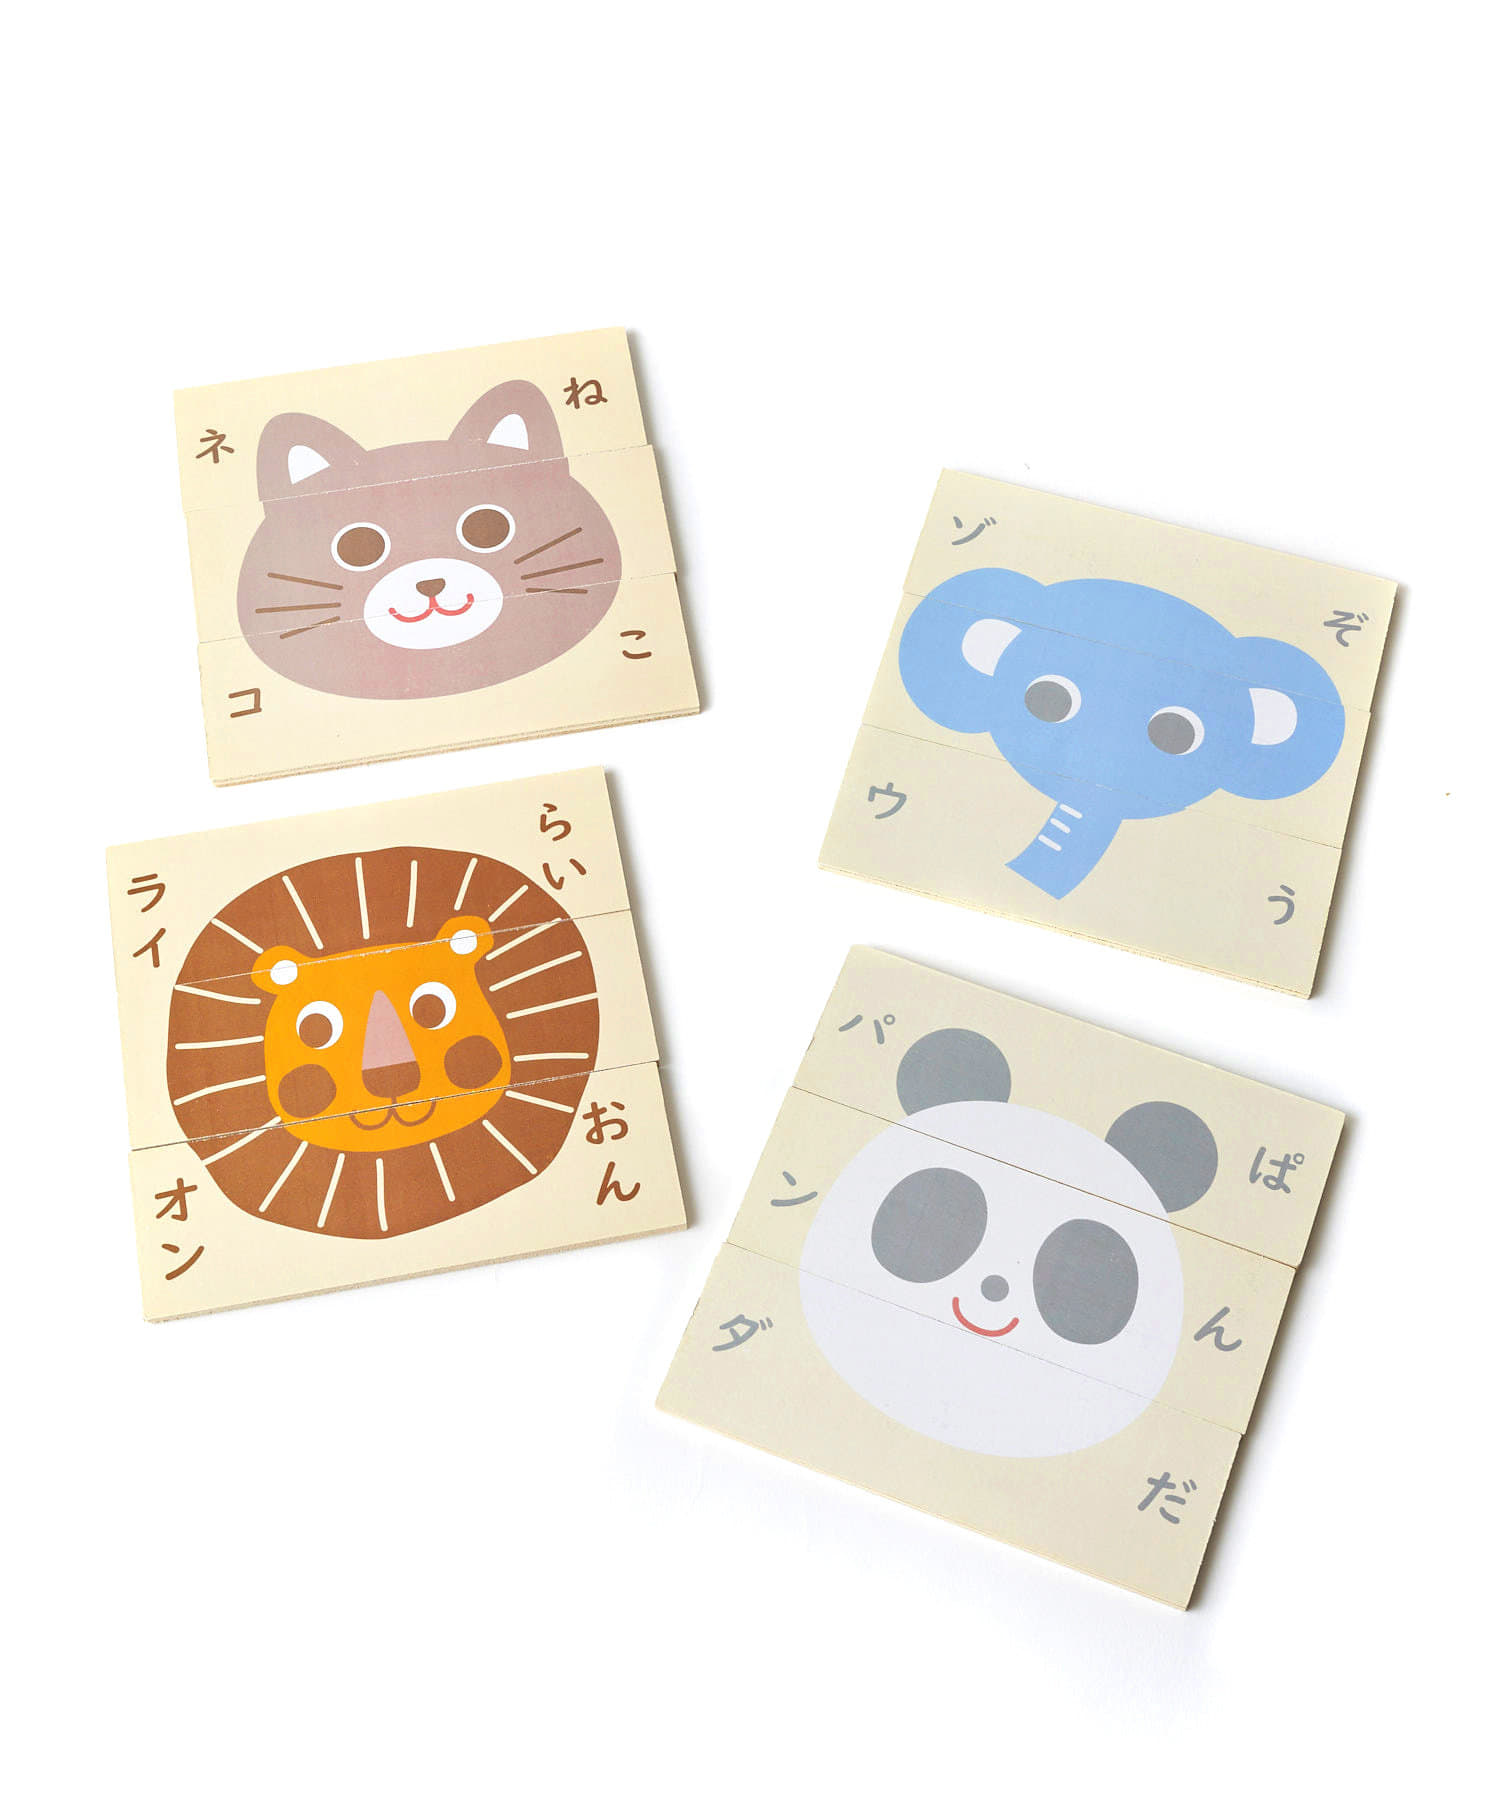 3COINS(スリーコインズ) 【楽しく学ぼう】絵合わせパズル:4枚入り